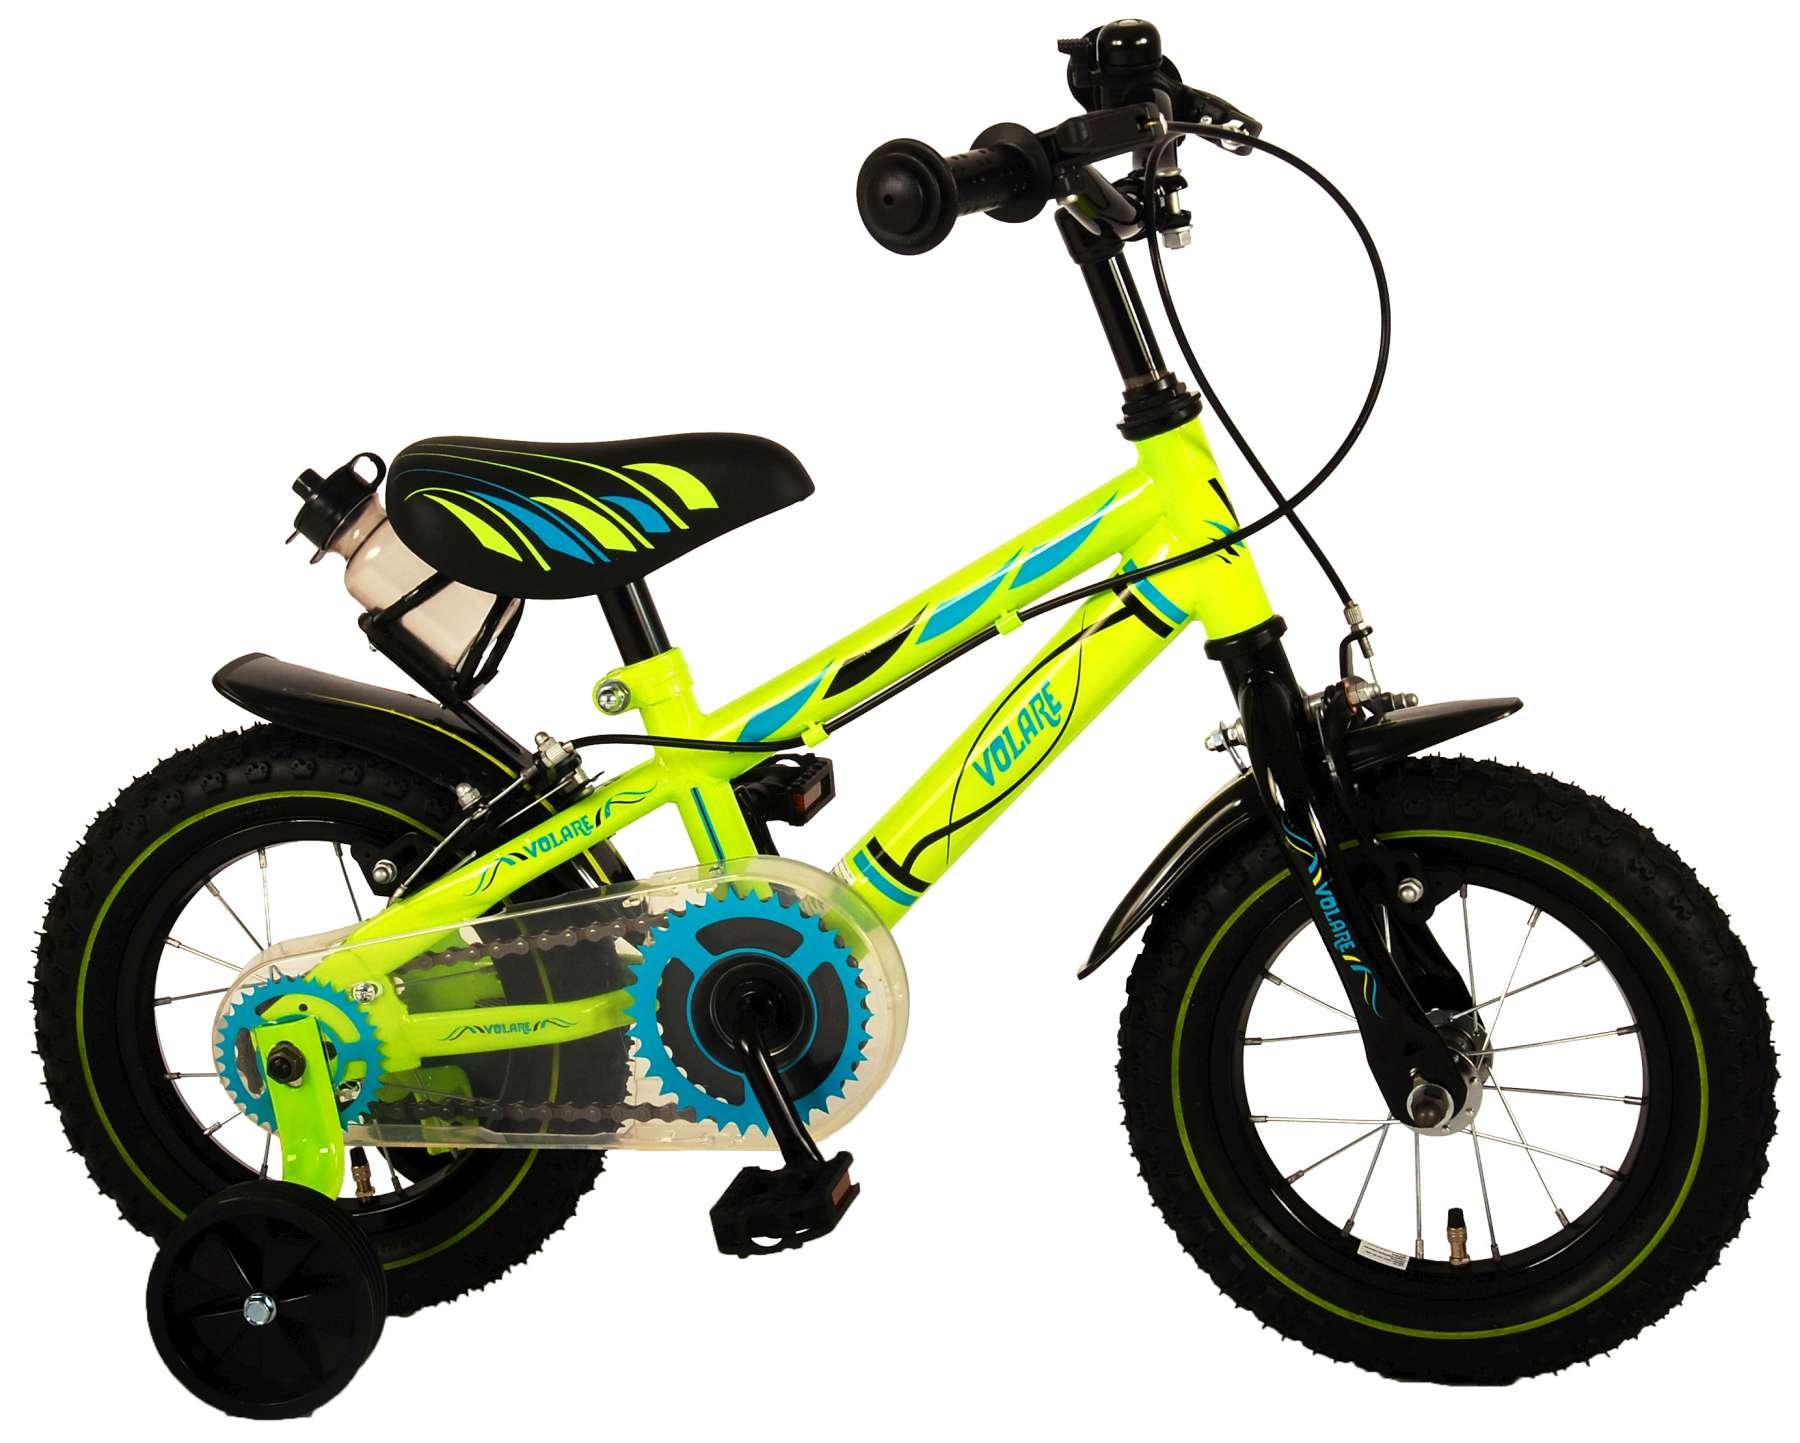 Kinderfahrrad 12 Zoll  Electric Green  - Zwei Handbremsen